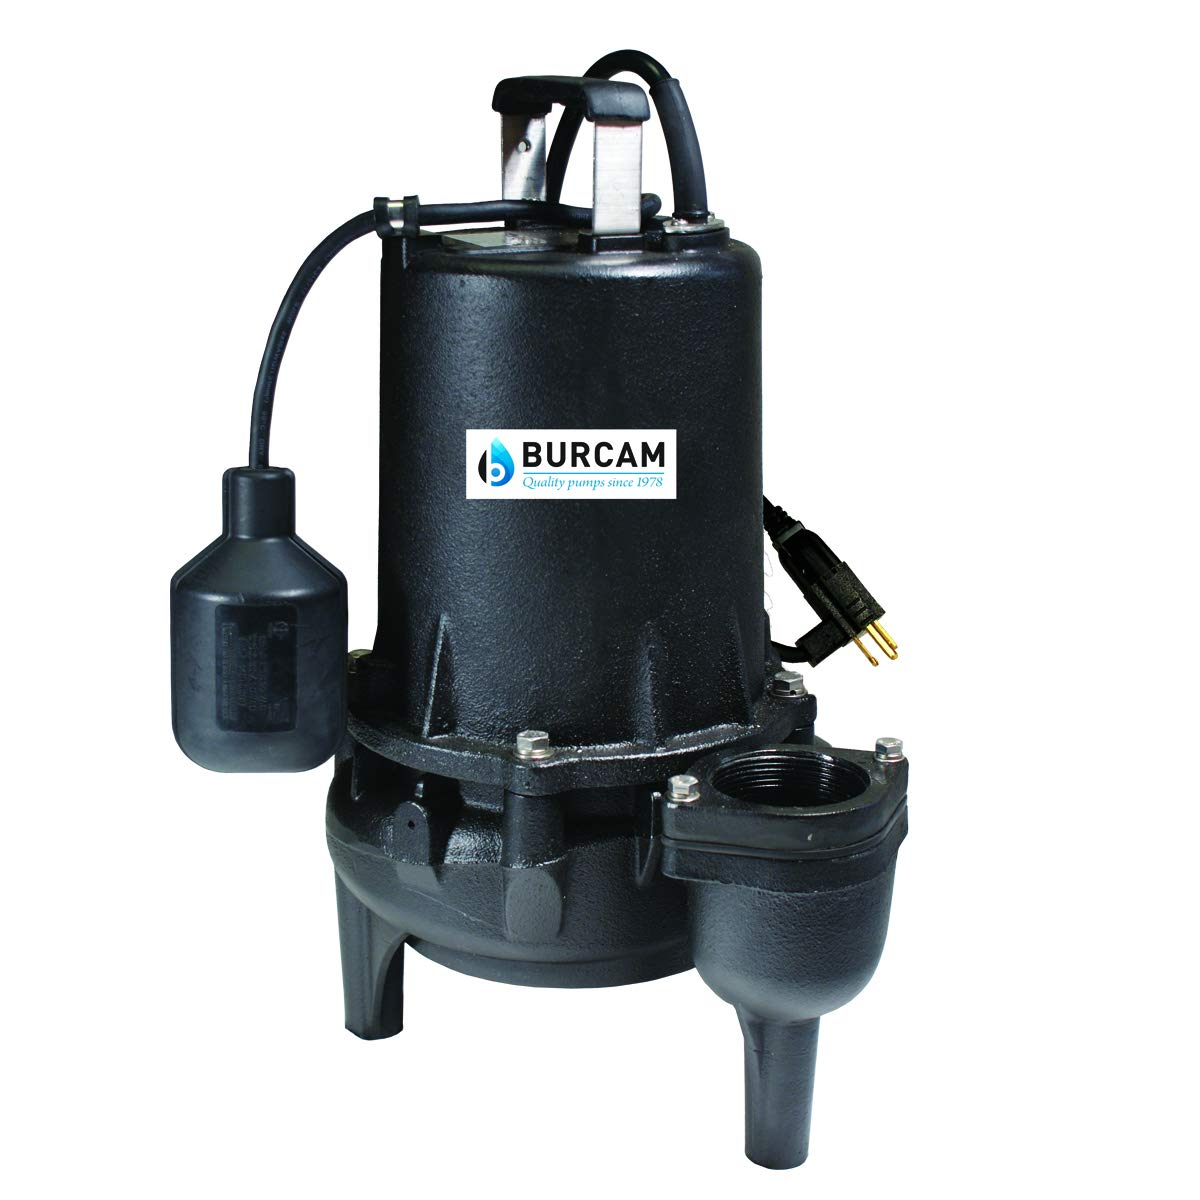 BURCAM 400539 3/4 HP Heavy Duty Cast Iron Sewage Ejector Pump Black